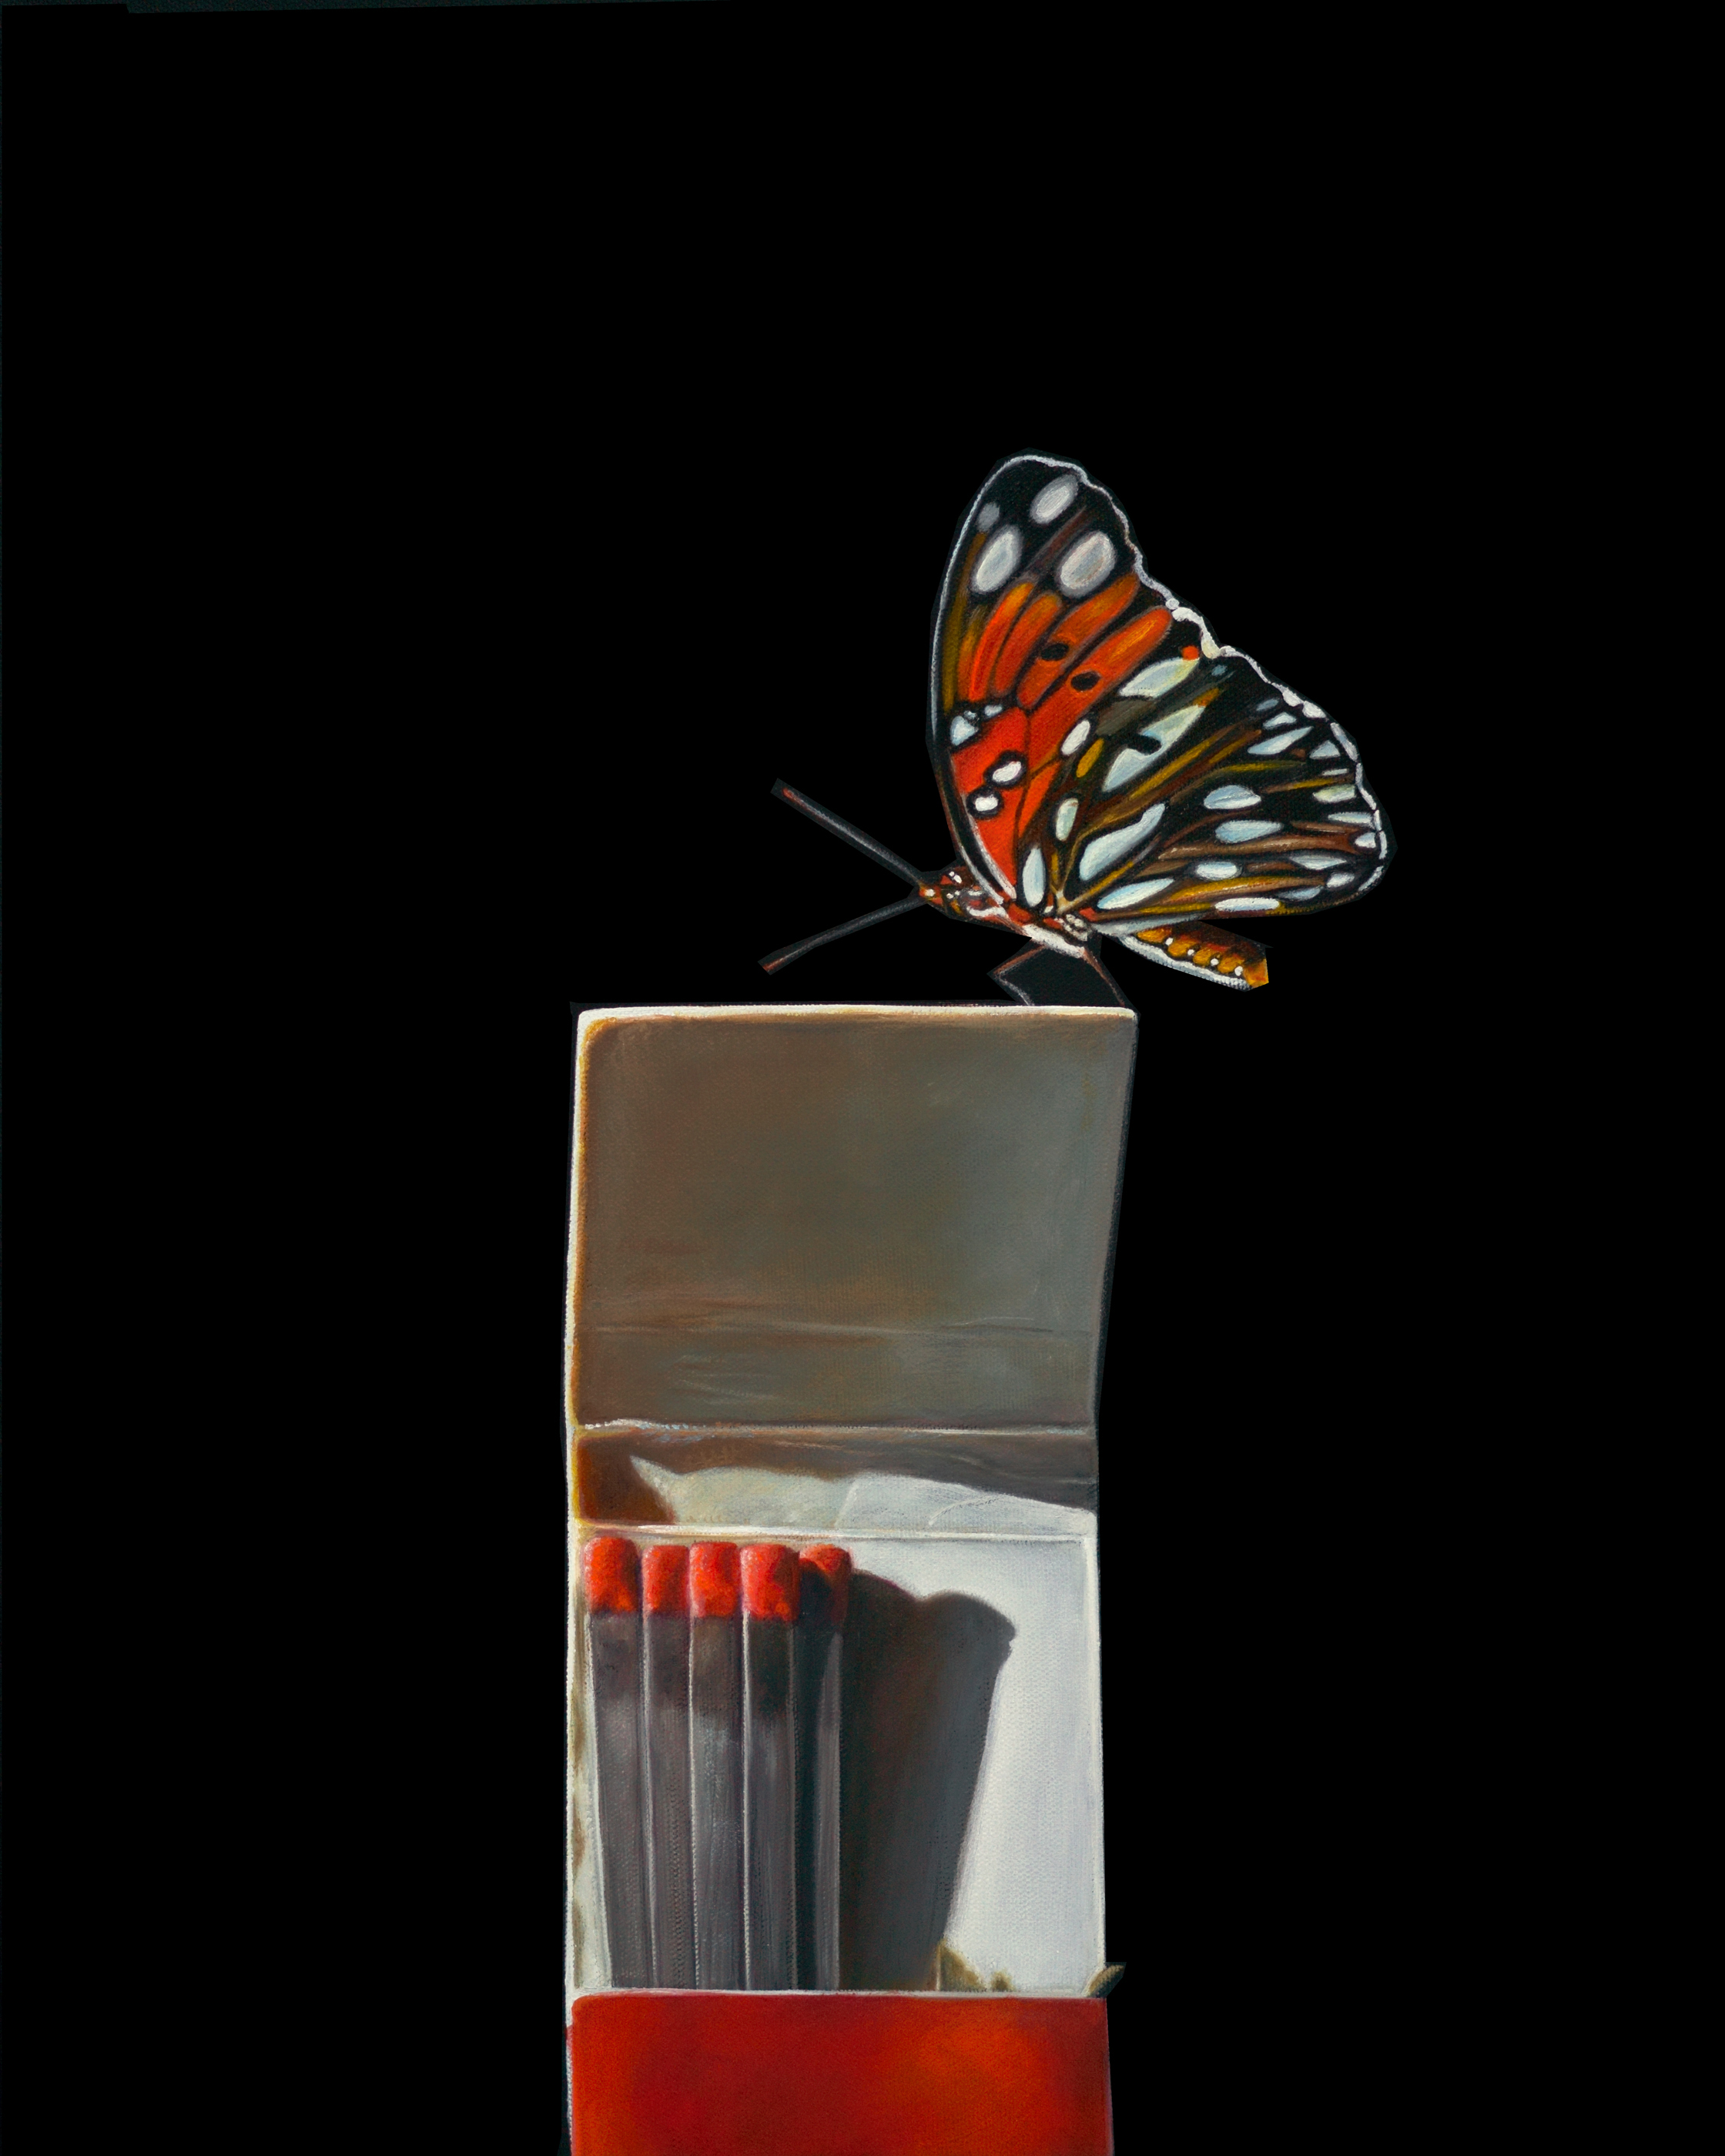 Striking | 16 x 20 | Oil on canvas